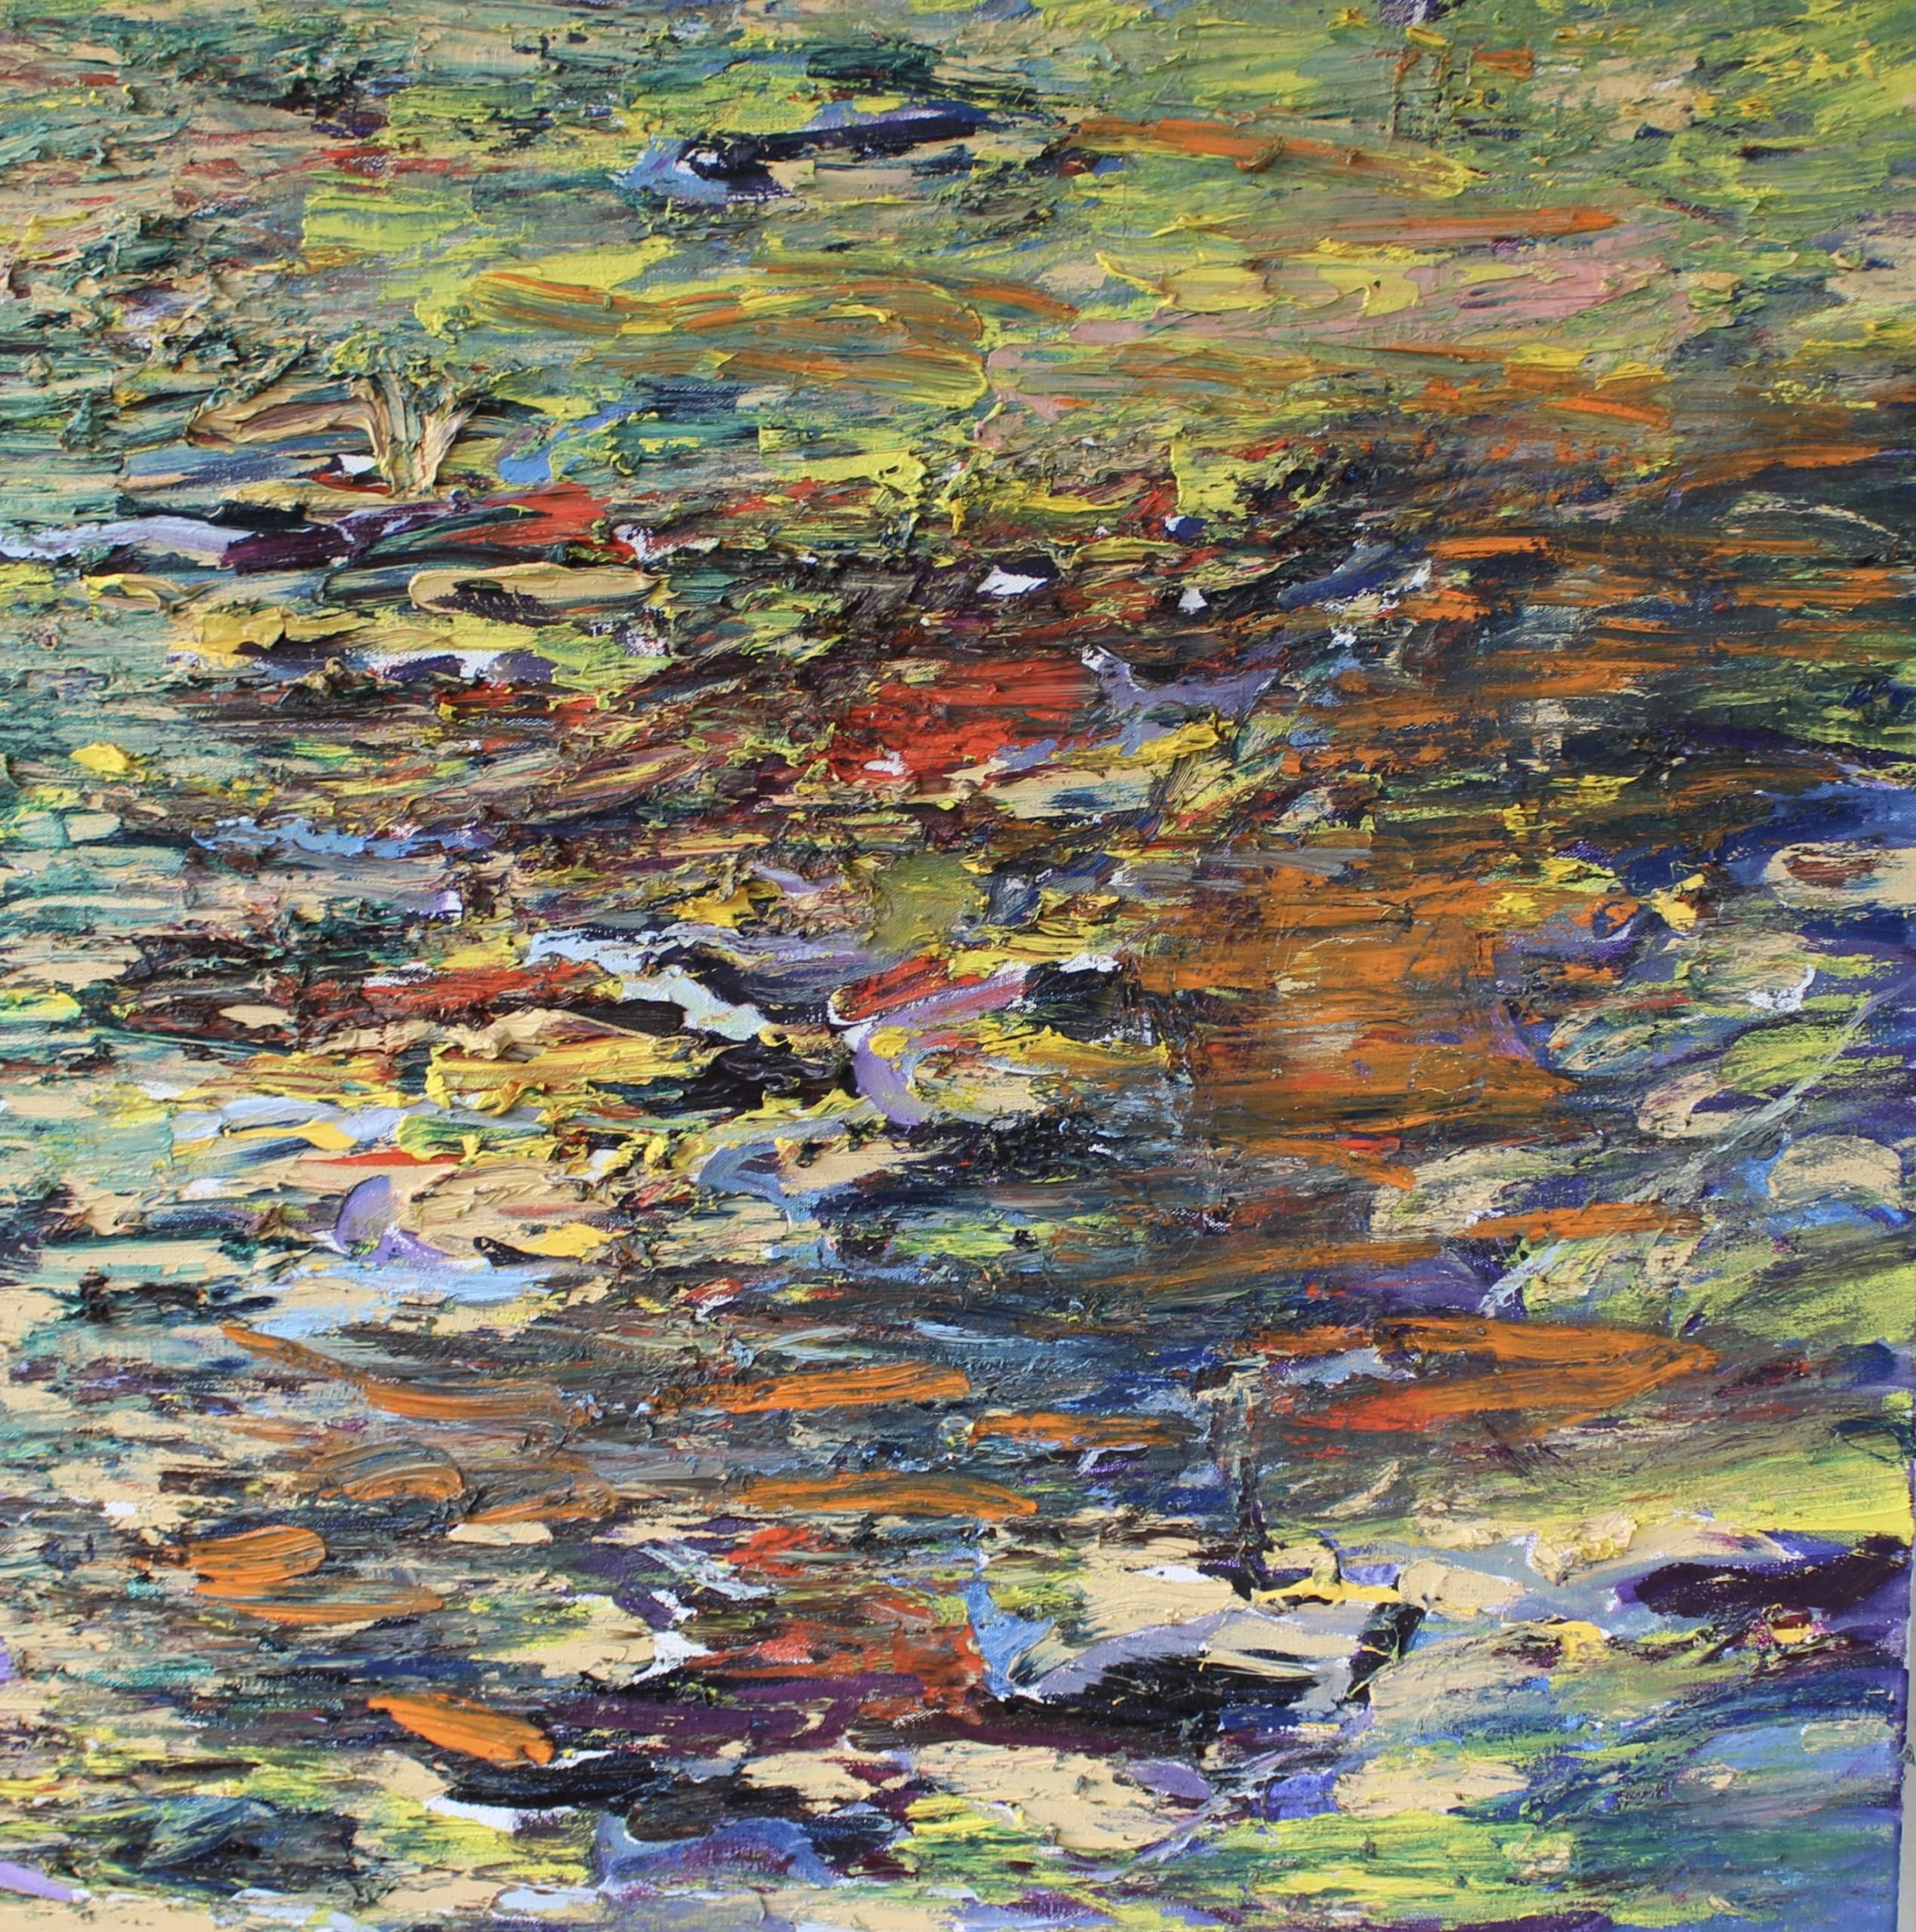 Reflections - William Bryant